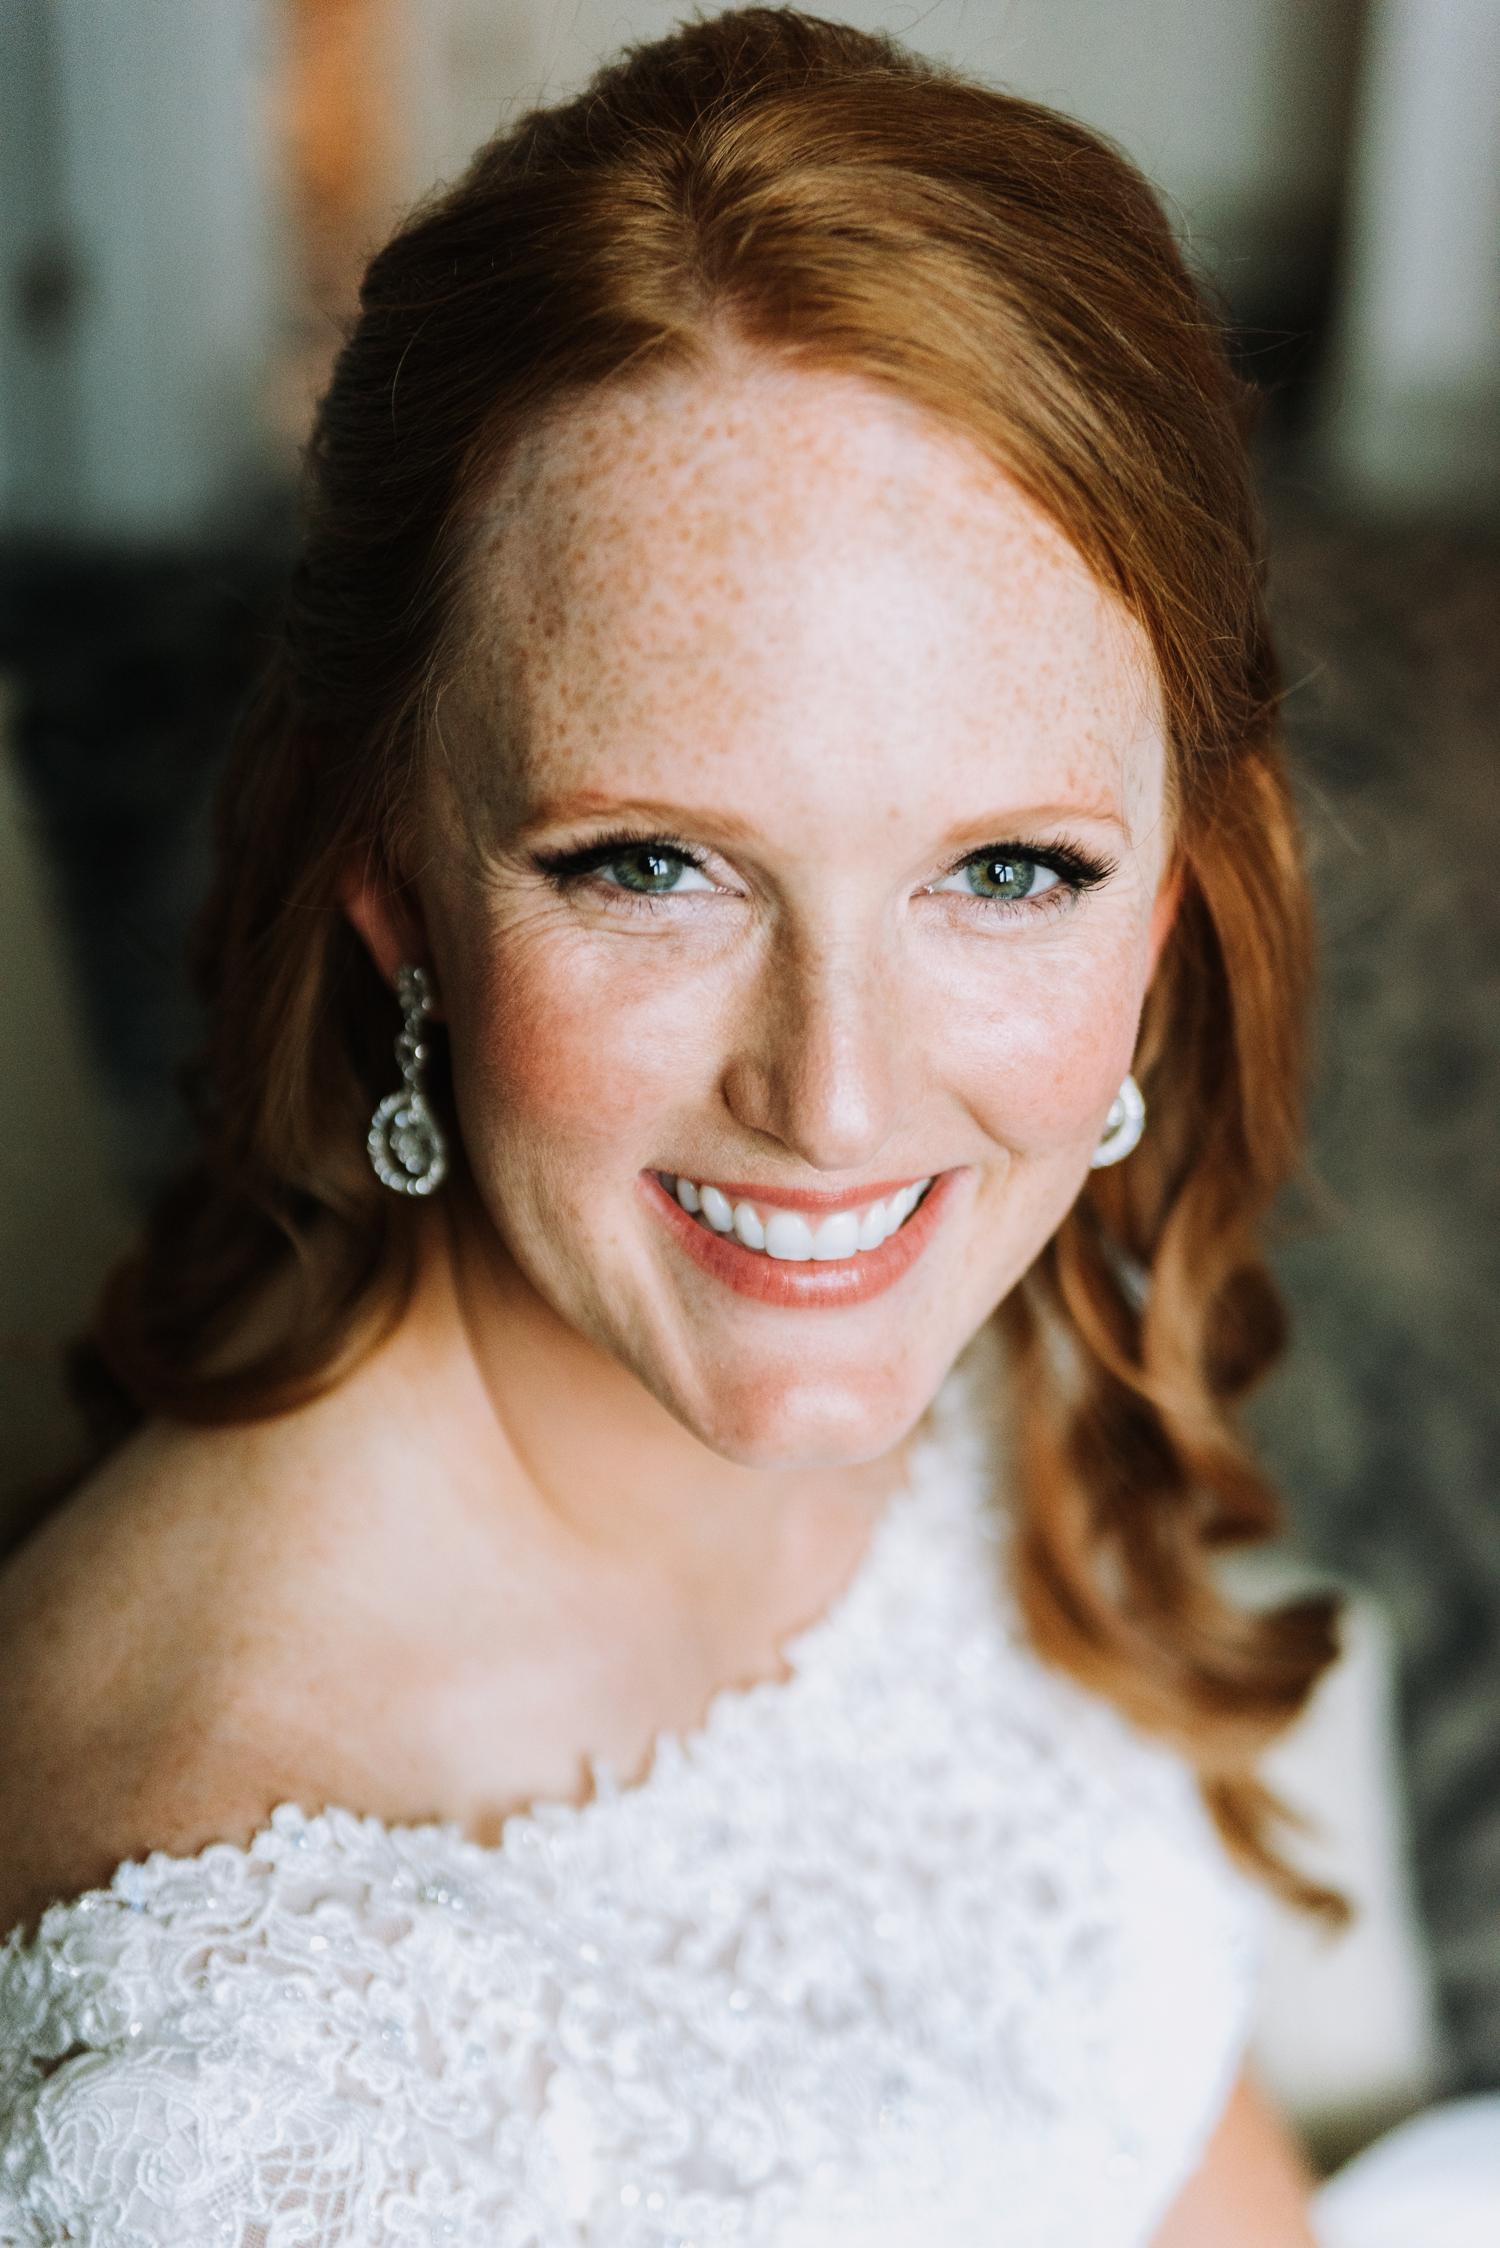 Gorgeous Bridal Makeup - Classic Indianapolis Wedding - Canal 337 Wedding - The Overwhelmed Bride Wedding Blog